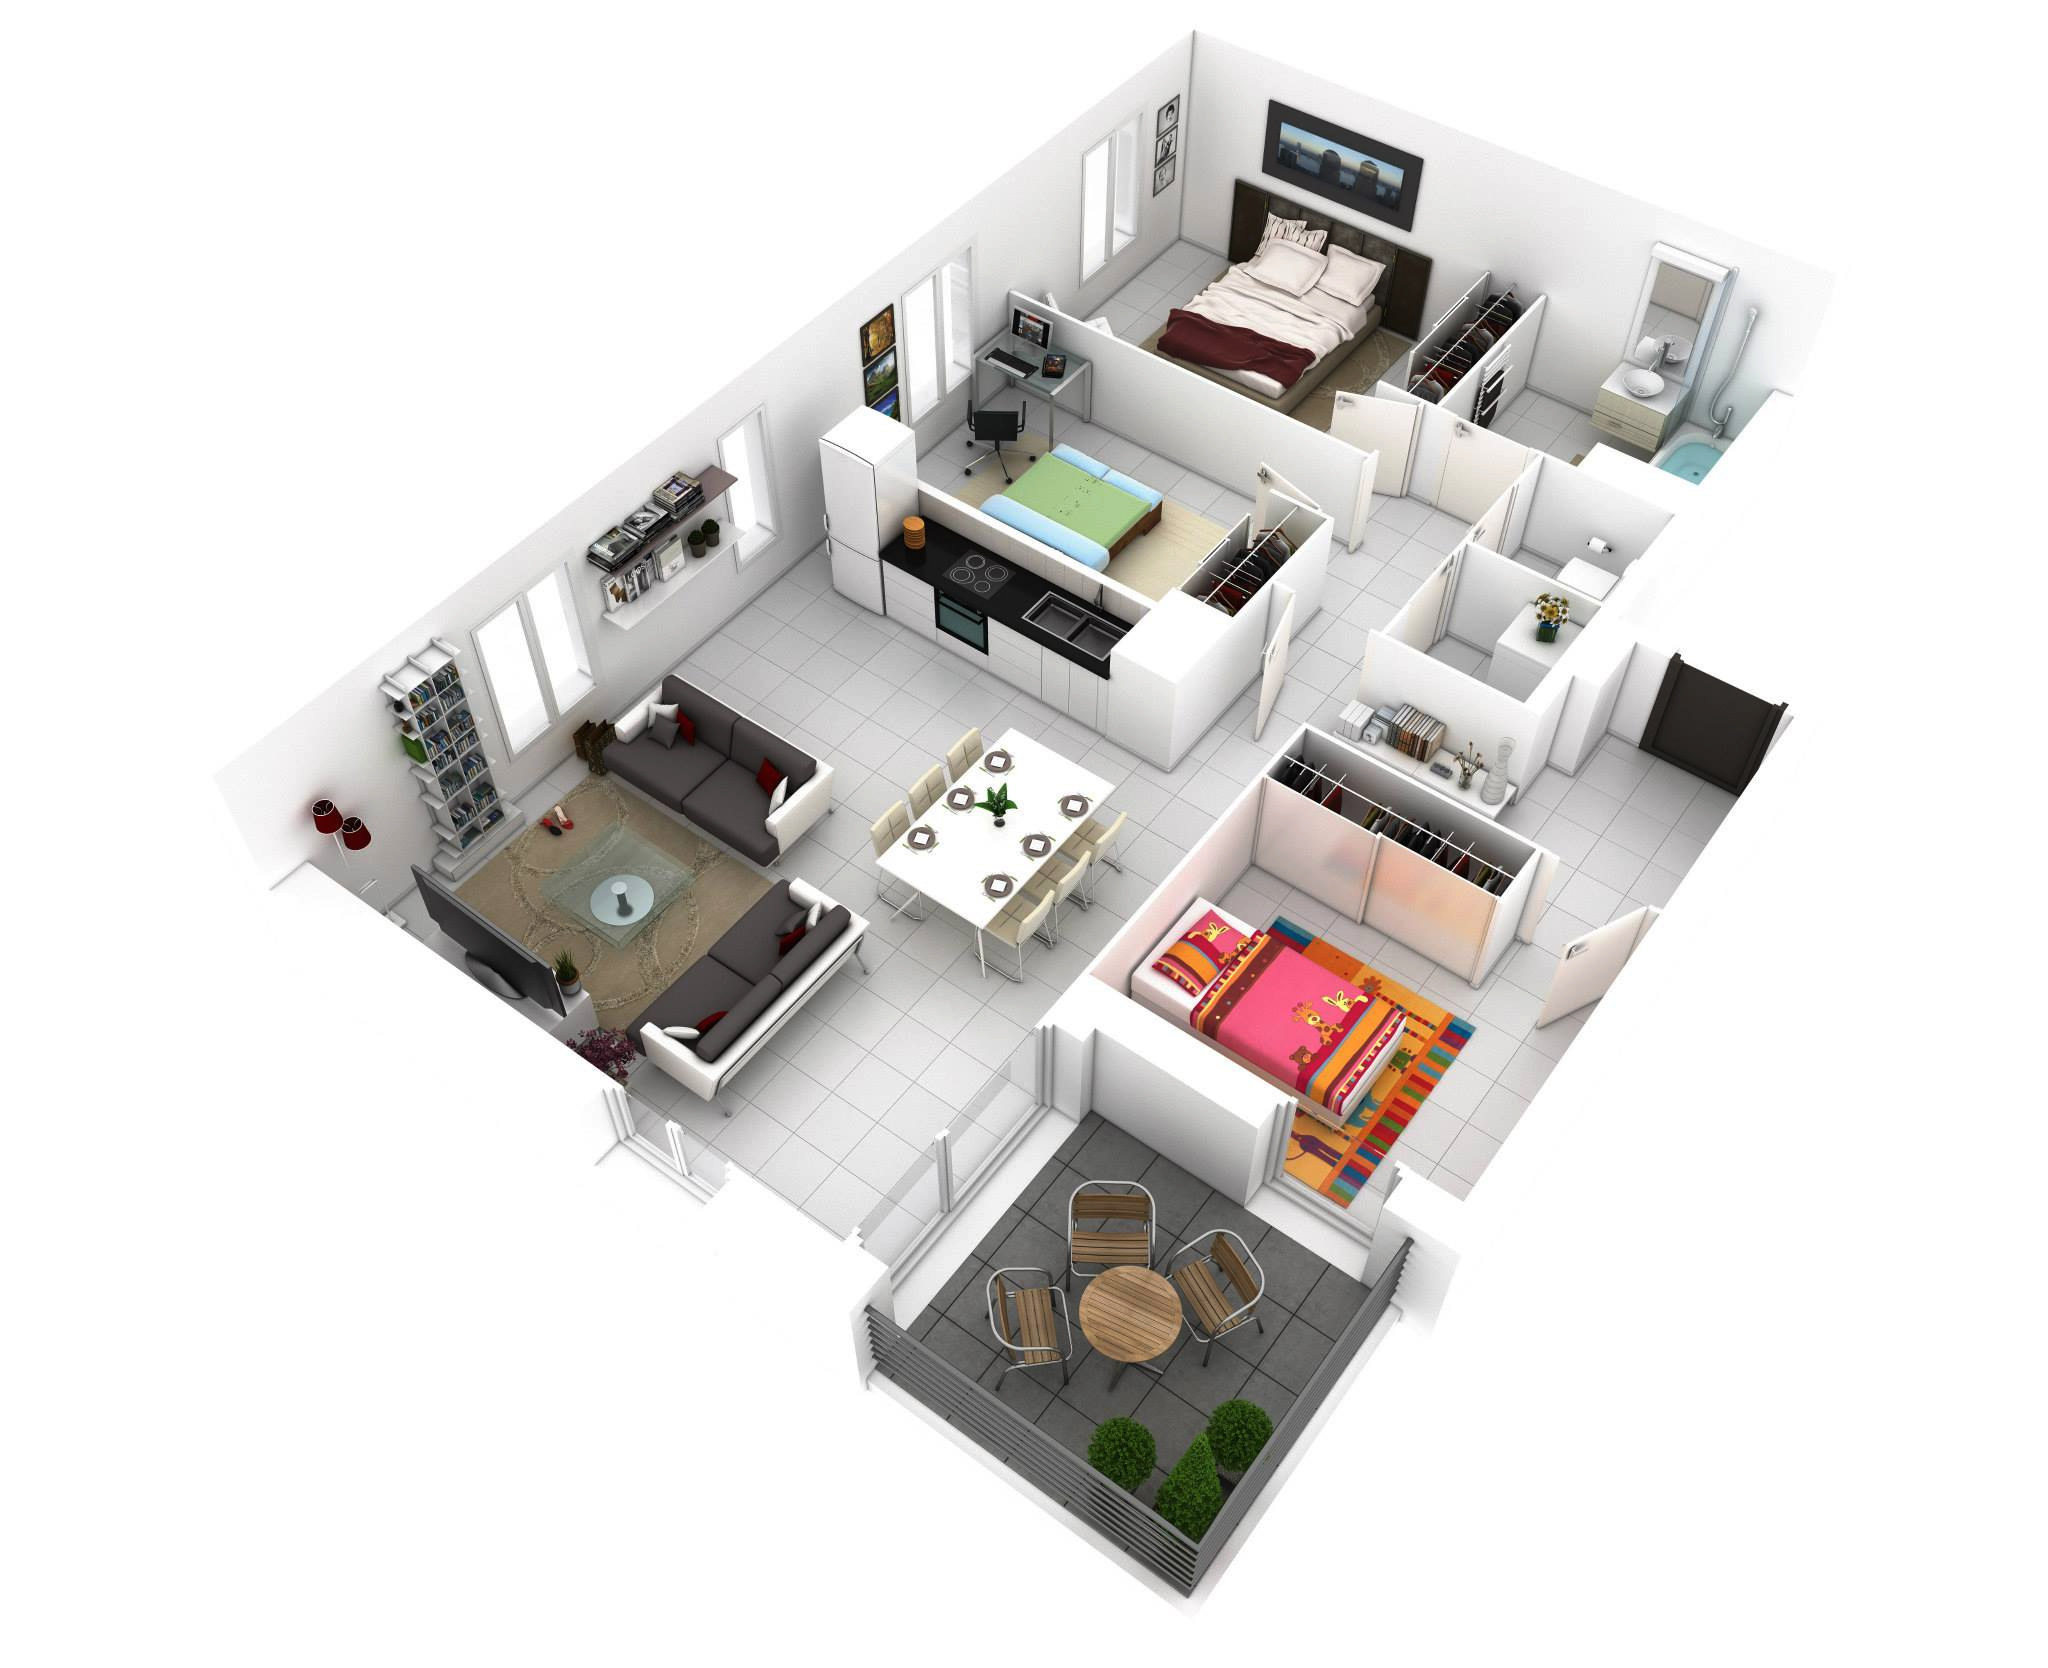 25 More 3 Bedroom 3d Floor Plans Architecture Design 3d House Plans Bedroom House Plans House Plans